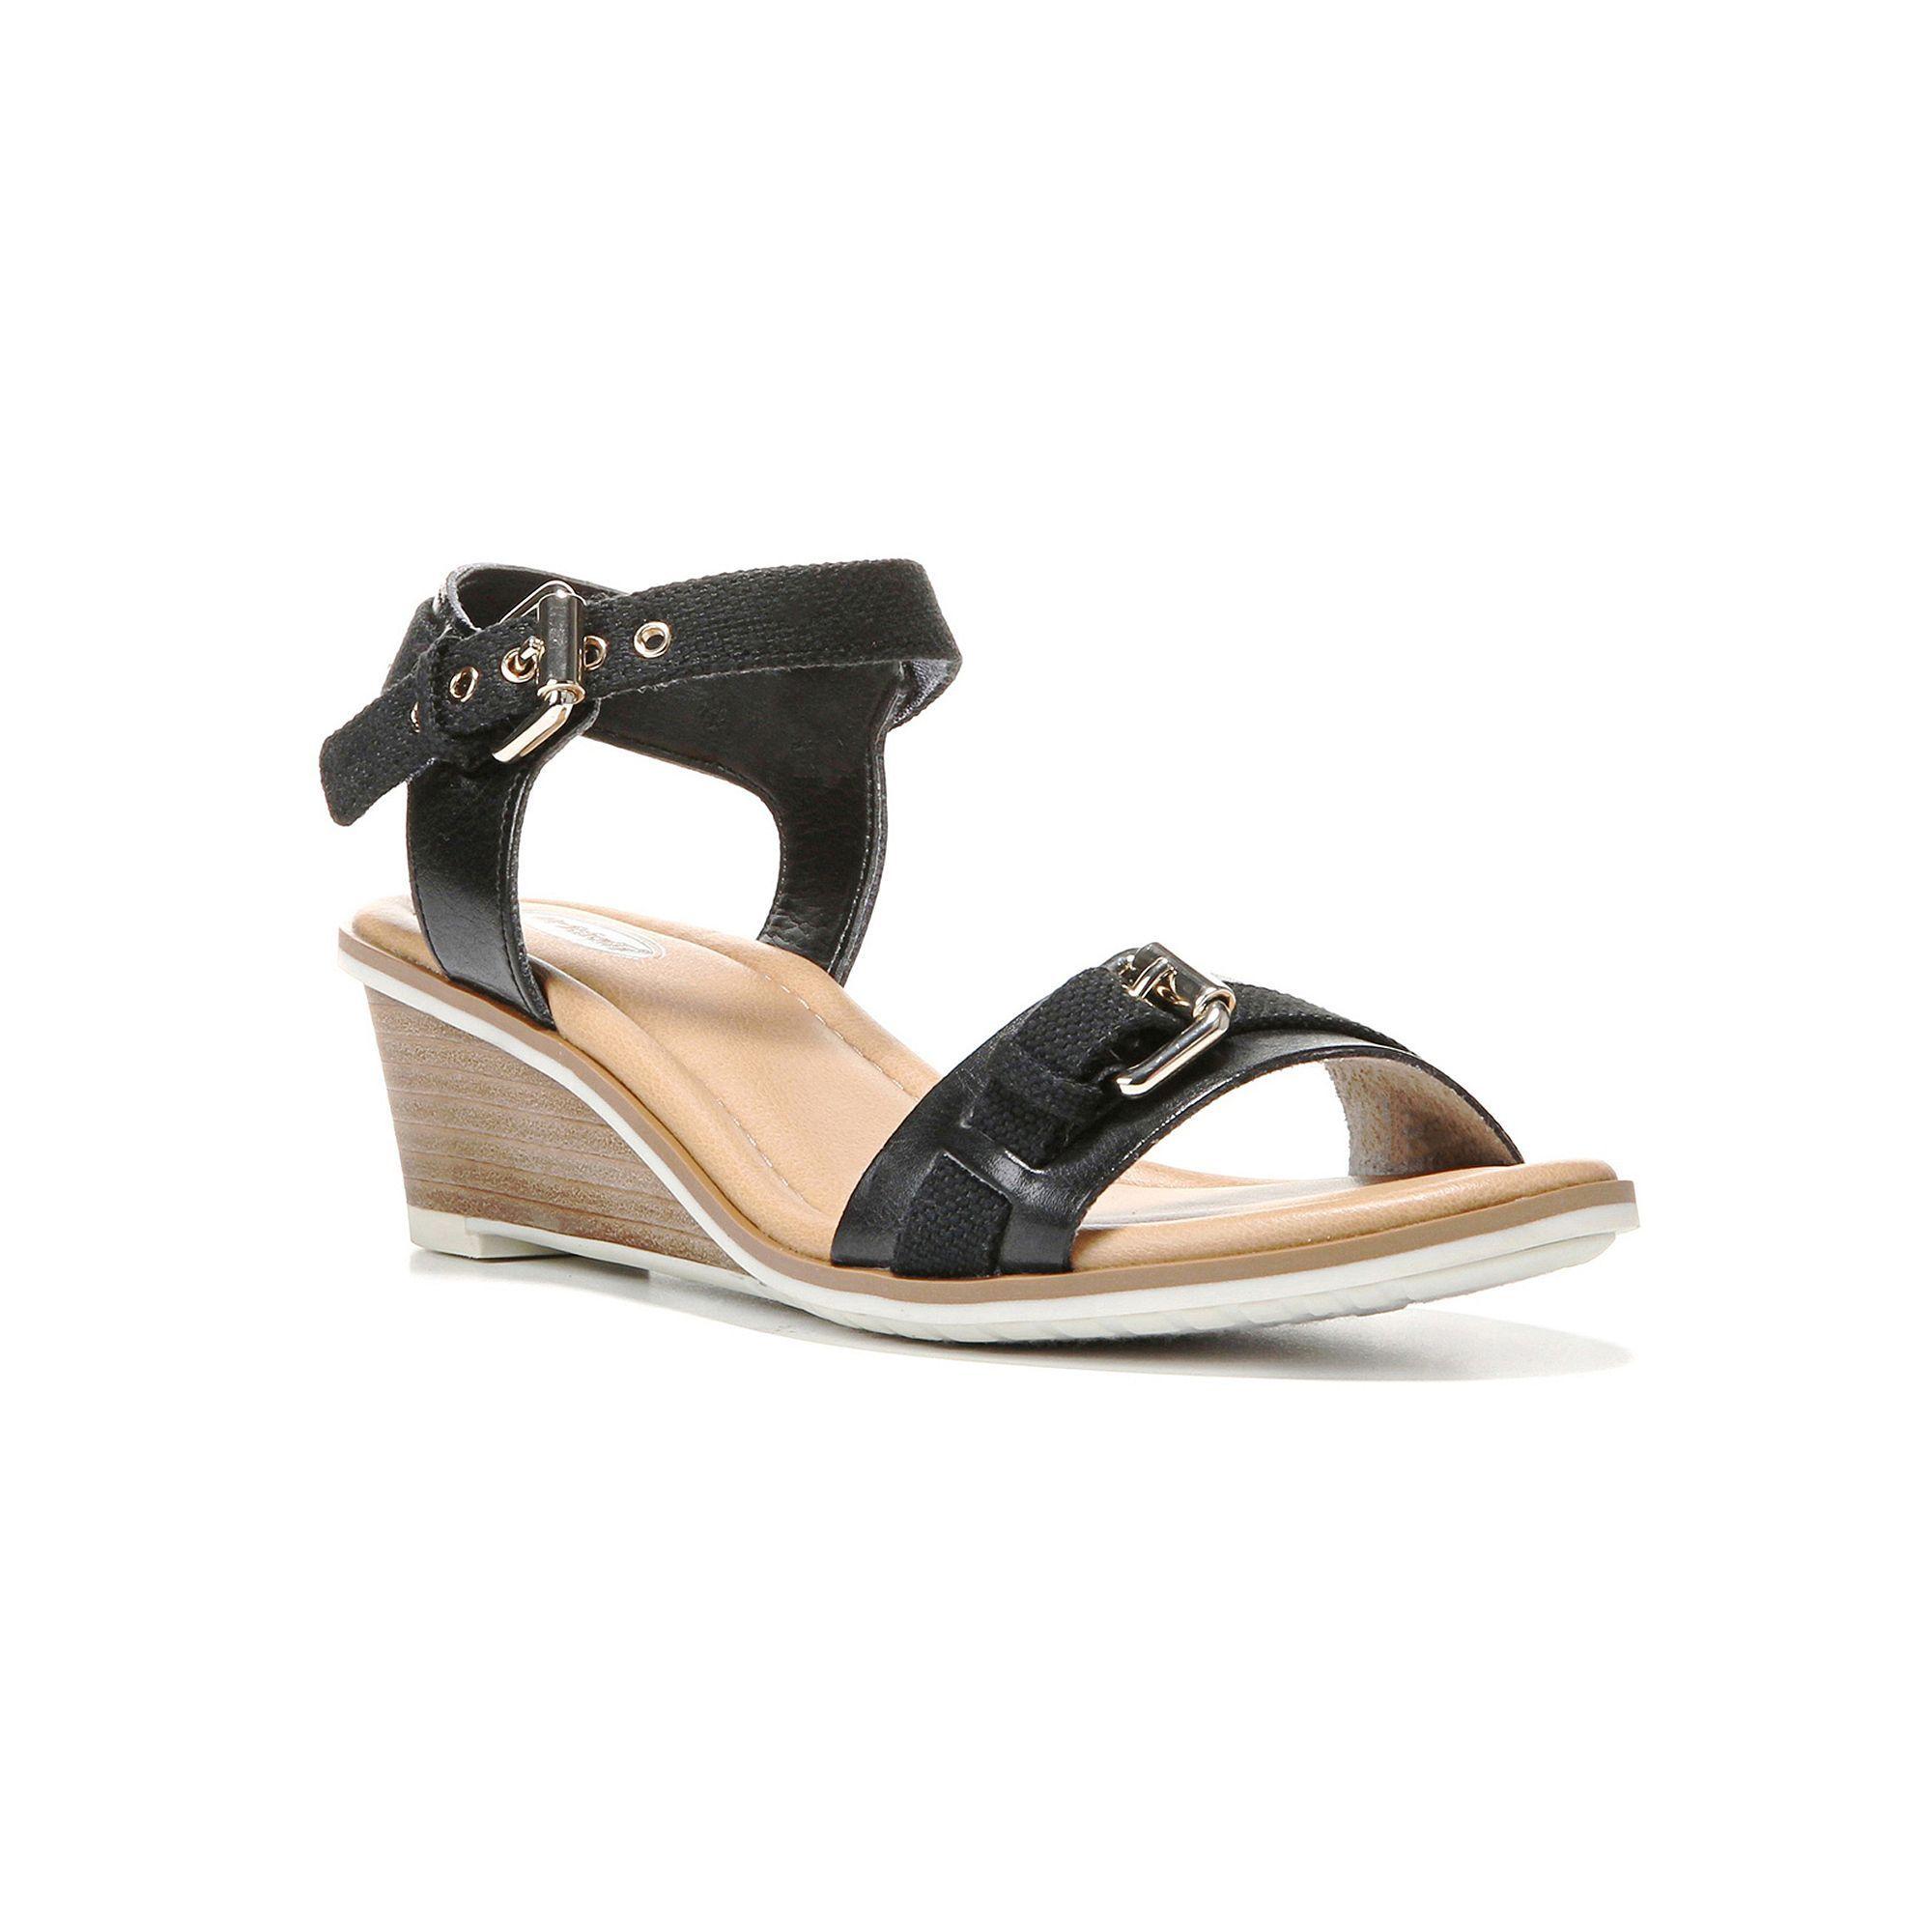 277d1a87c19 Dr. Scholl s Glendale Women s Wedge Sandals